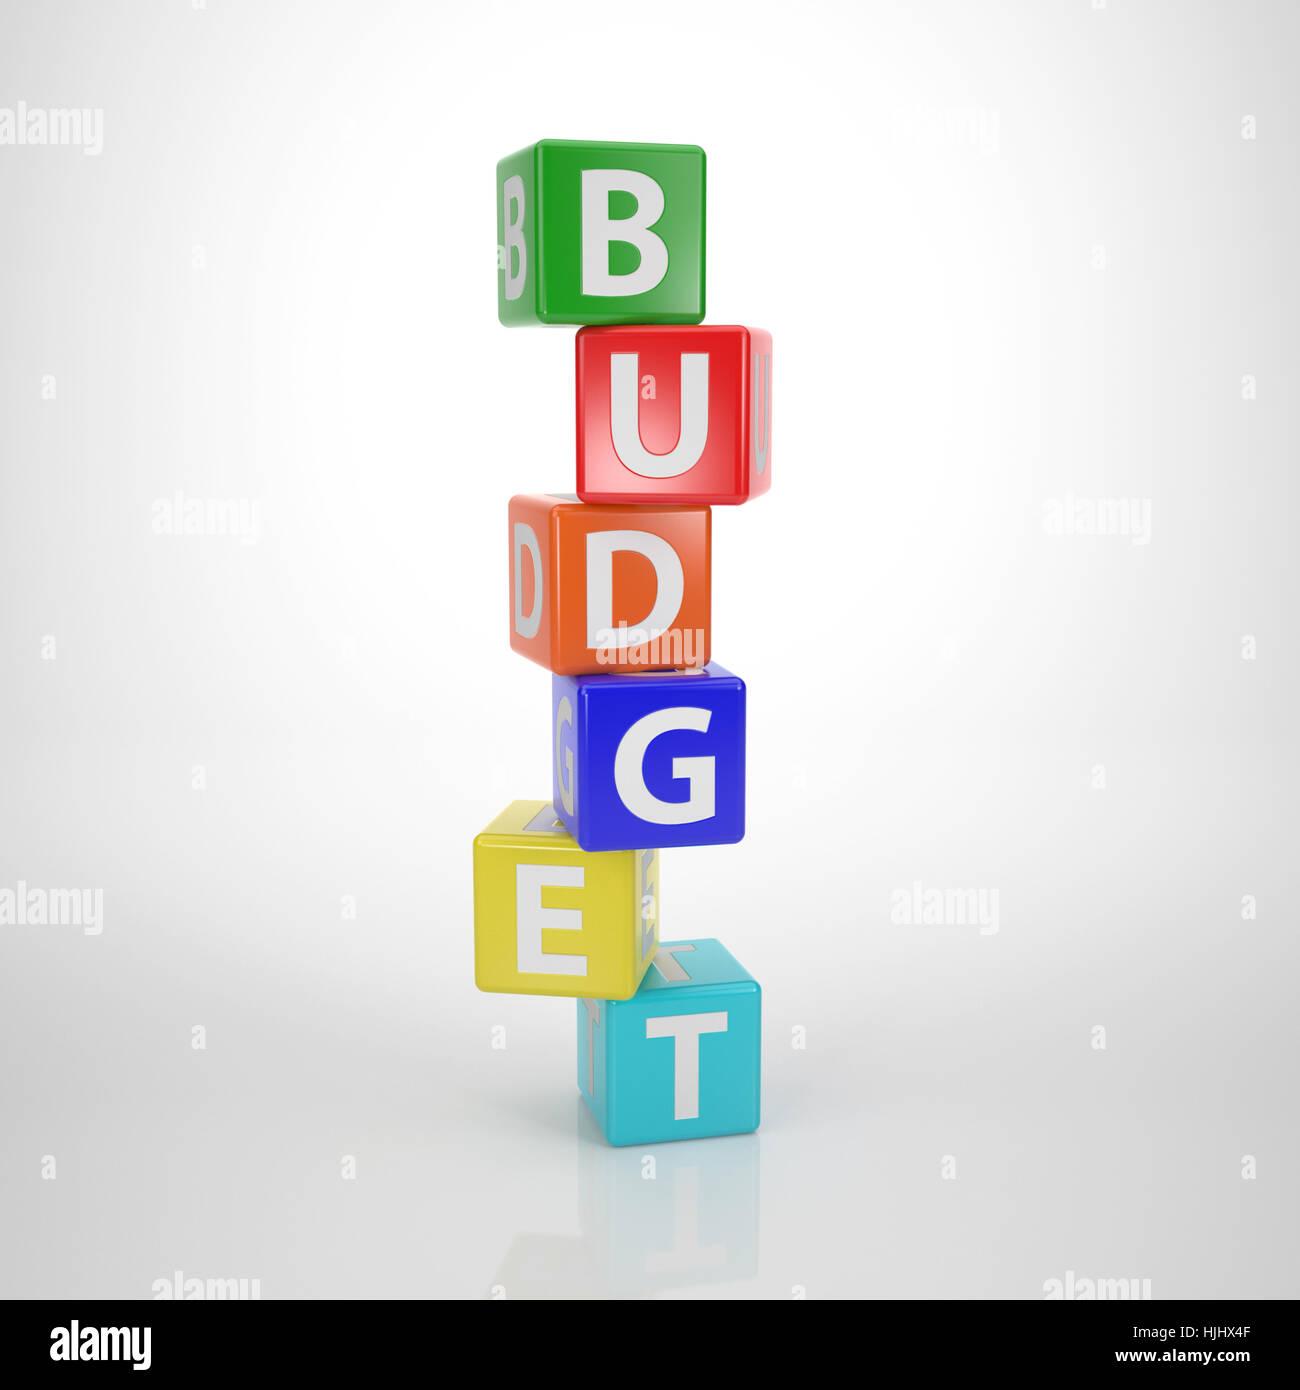 Turm Modell Entwurf Projekt Konzept Plan Entwurf Budget